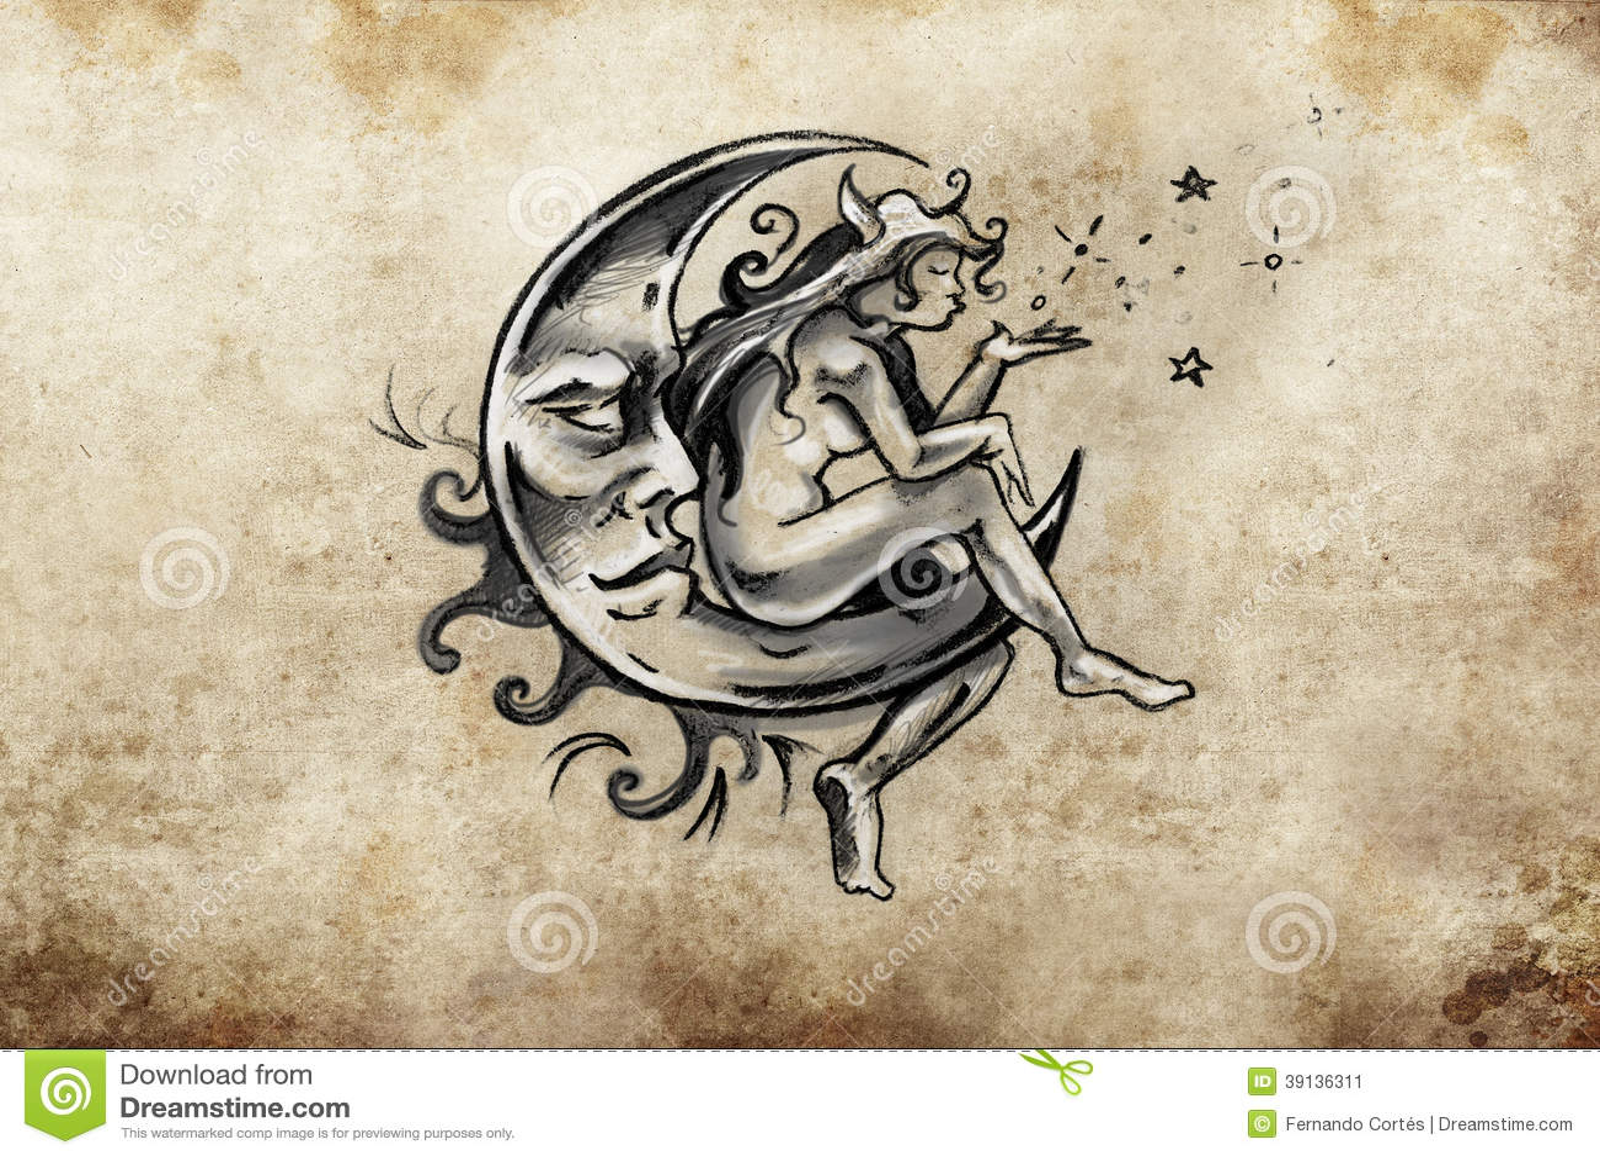 Fairy Sitting On The Moon Tattoo Sketch Handmade Design Over V Stock Illustration Image